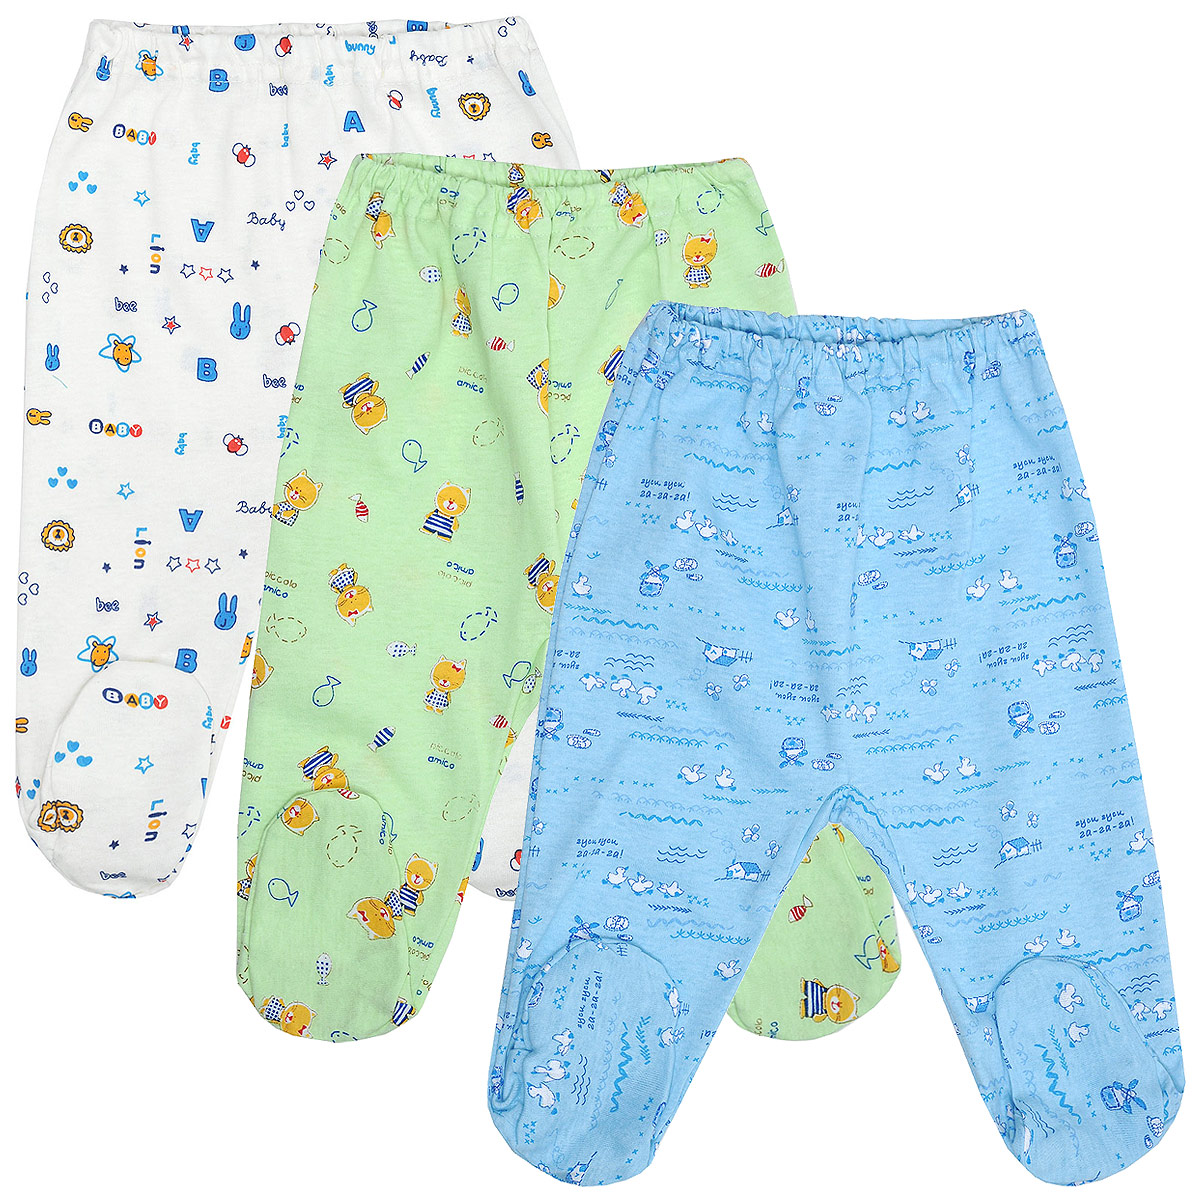 Комплект ползунков для мальчика Фреш стайл, 3 цвета, шт. 10-506м. Размер 62, до месяцев